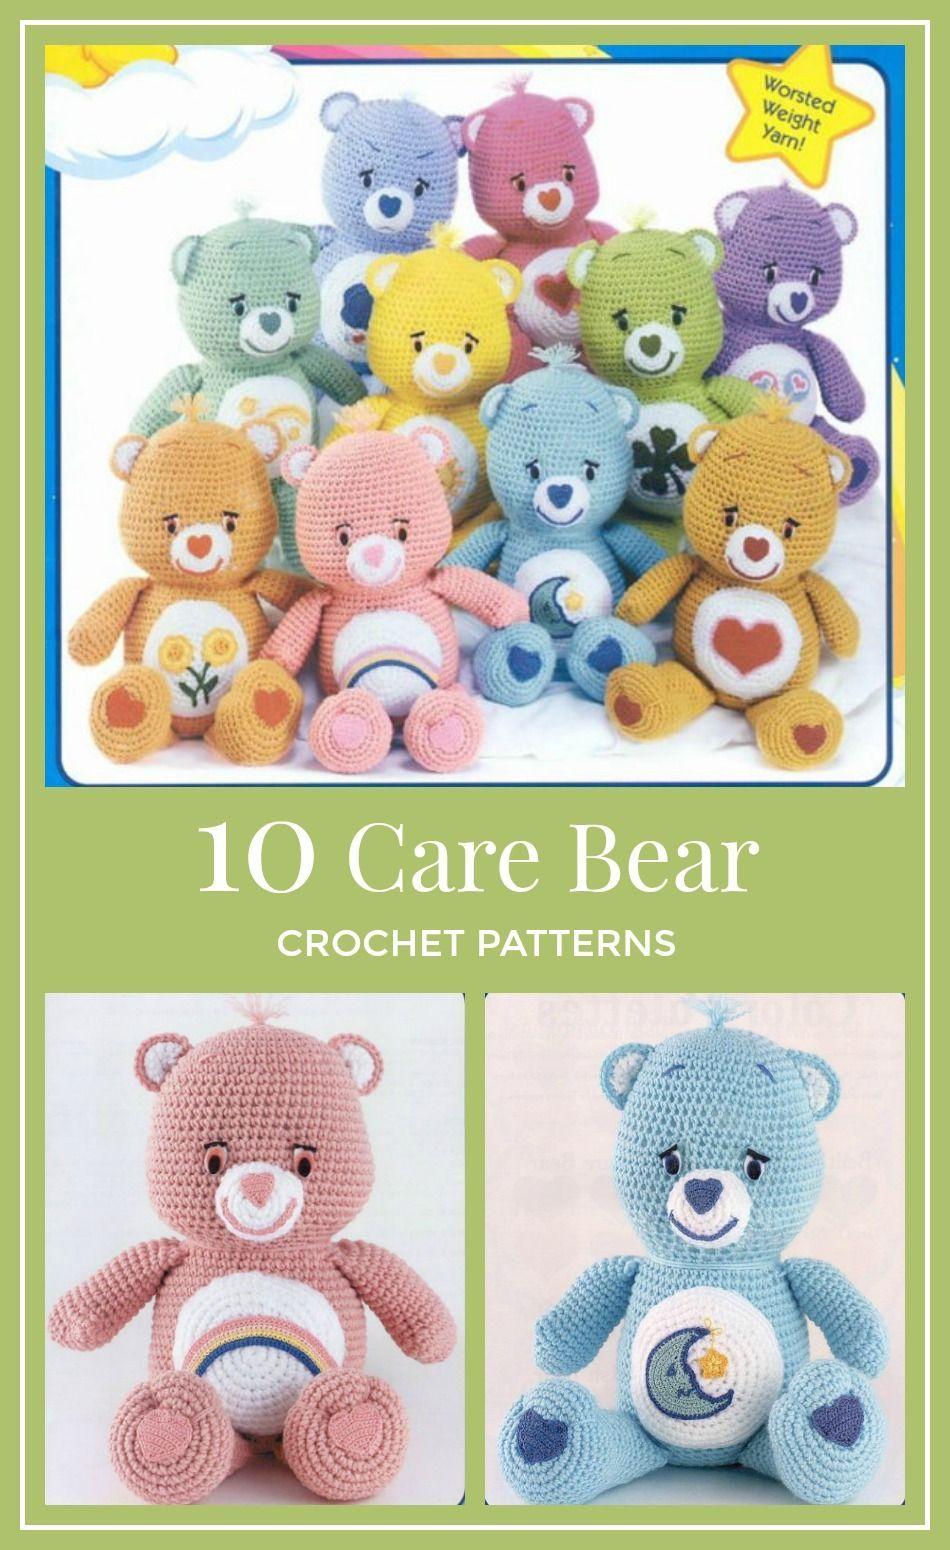 CareBears! Ten (10) Adorable CareBear Crochet Patterns | crochet ...